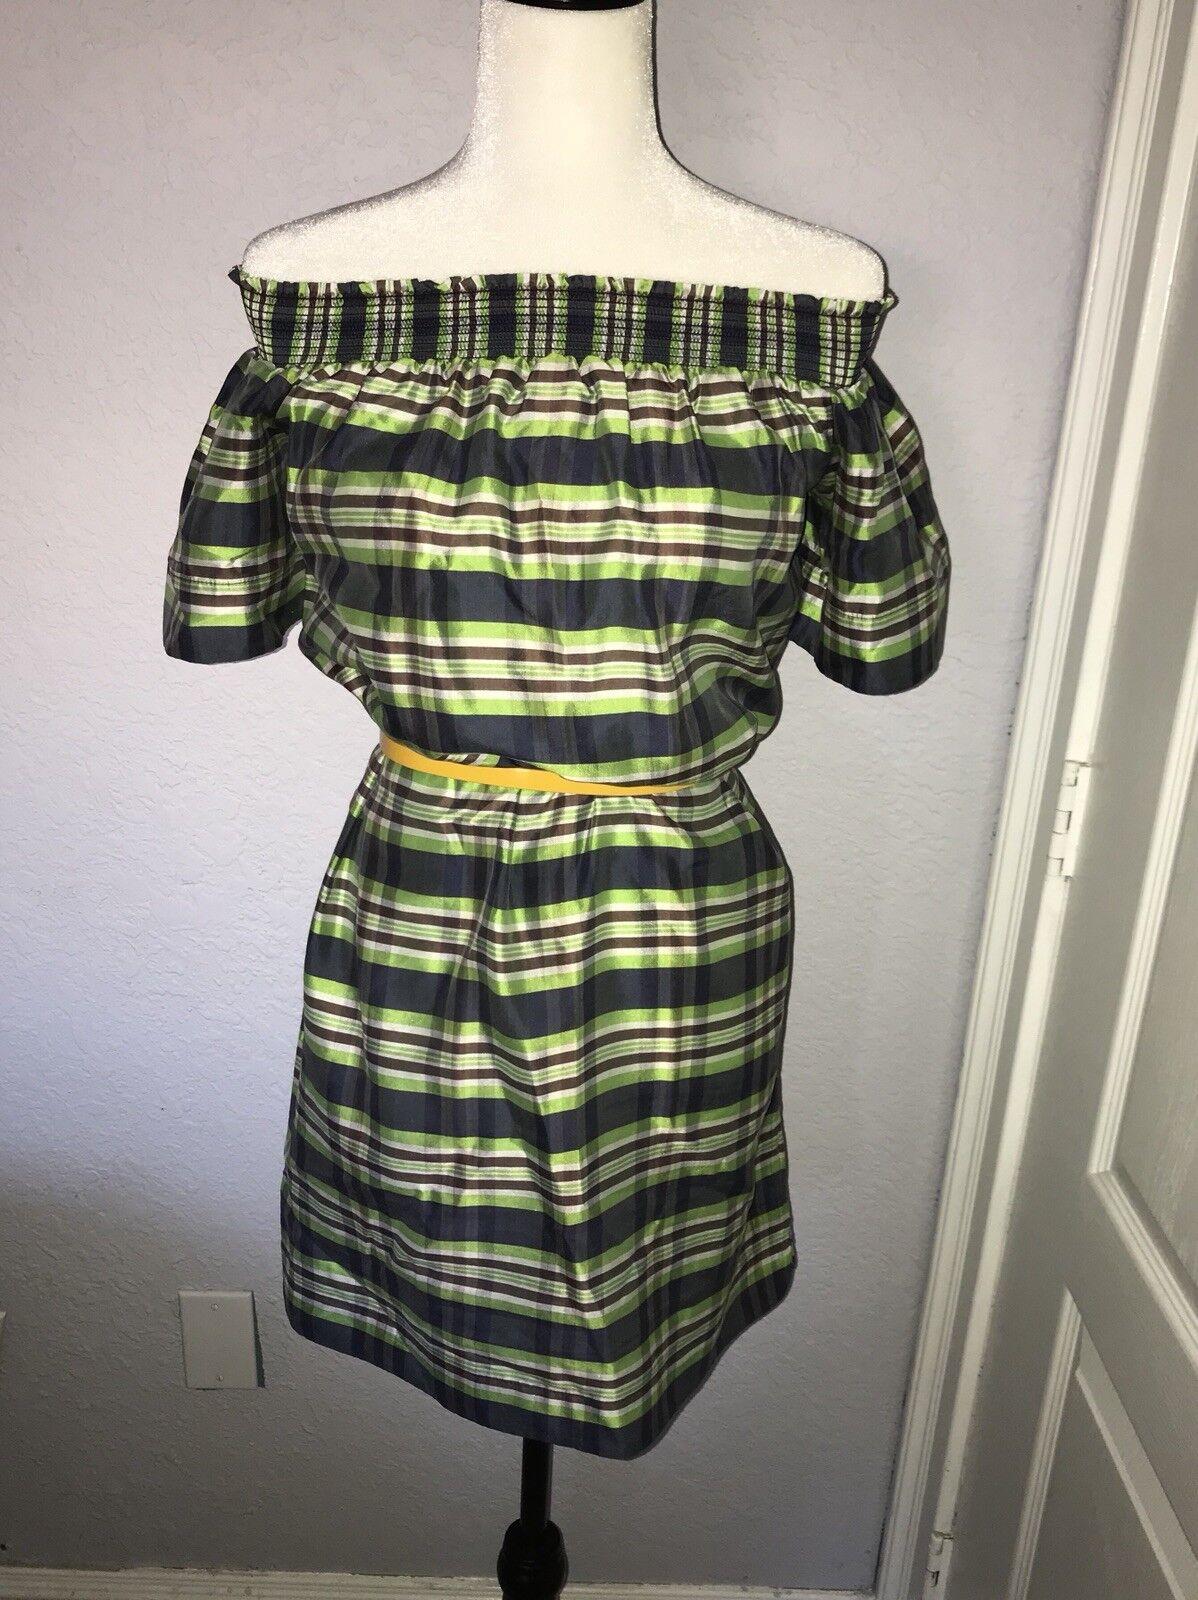 J.Crew Collection Off the Shoulder Dress in Yarn Dyed Silk Silk Silk Emerald Multi Sz 2 607a5a